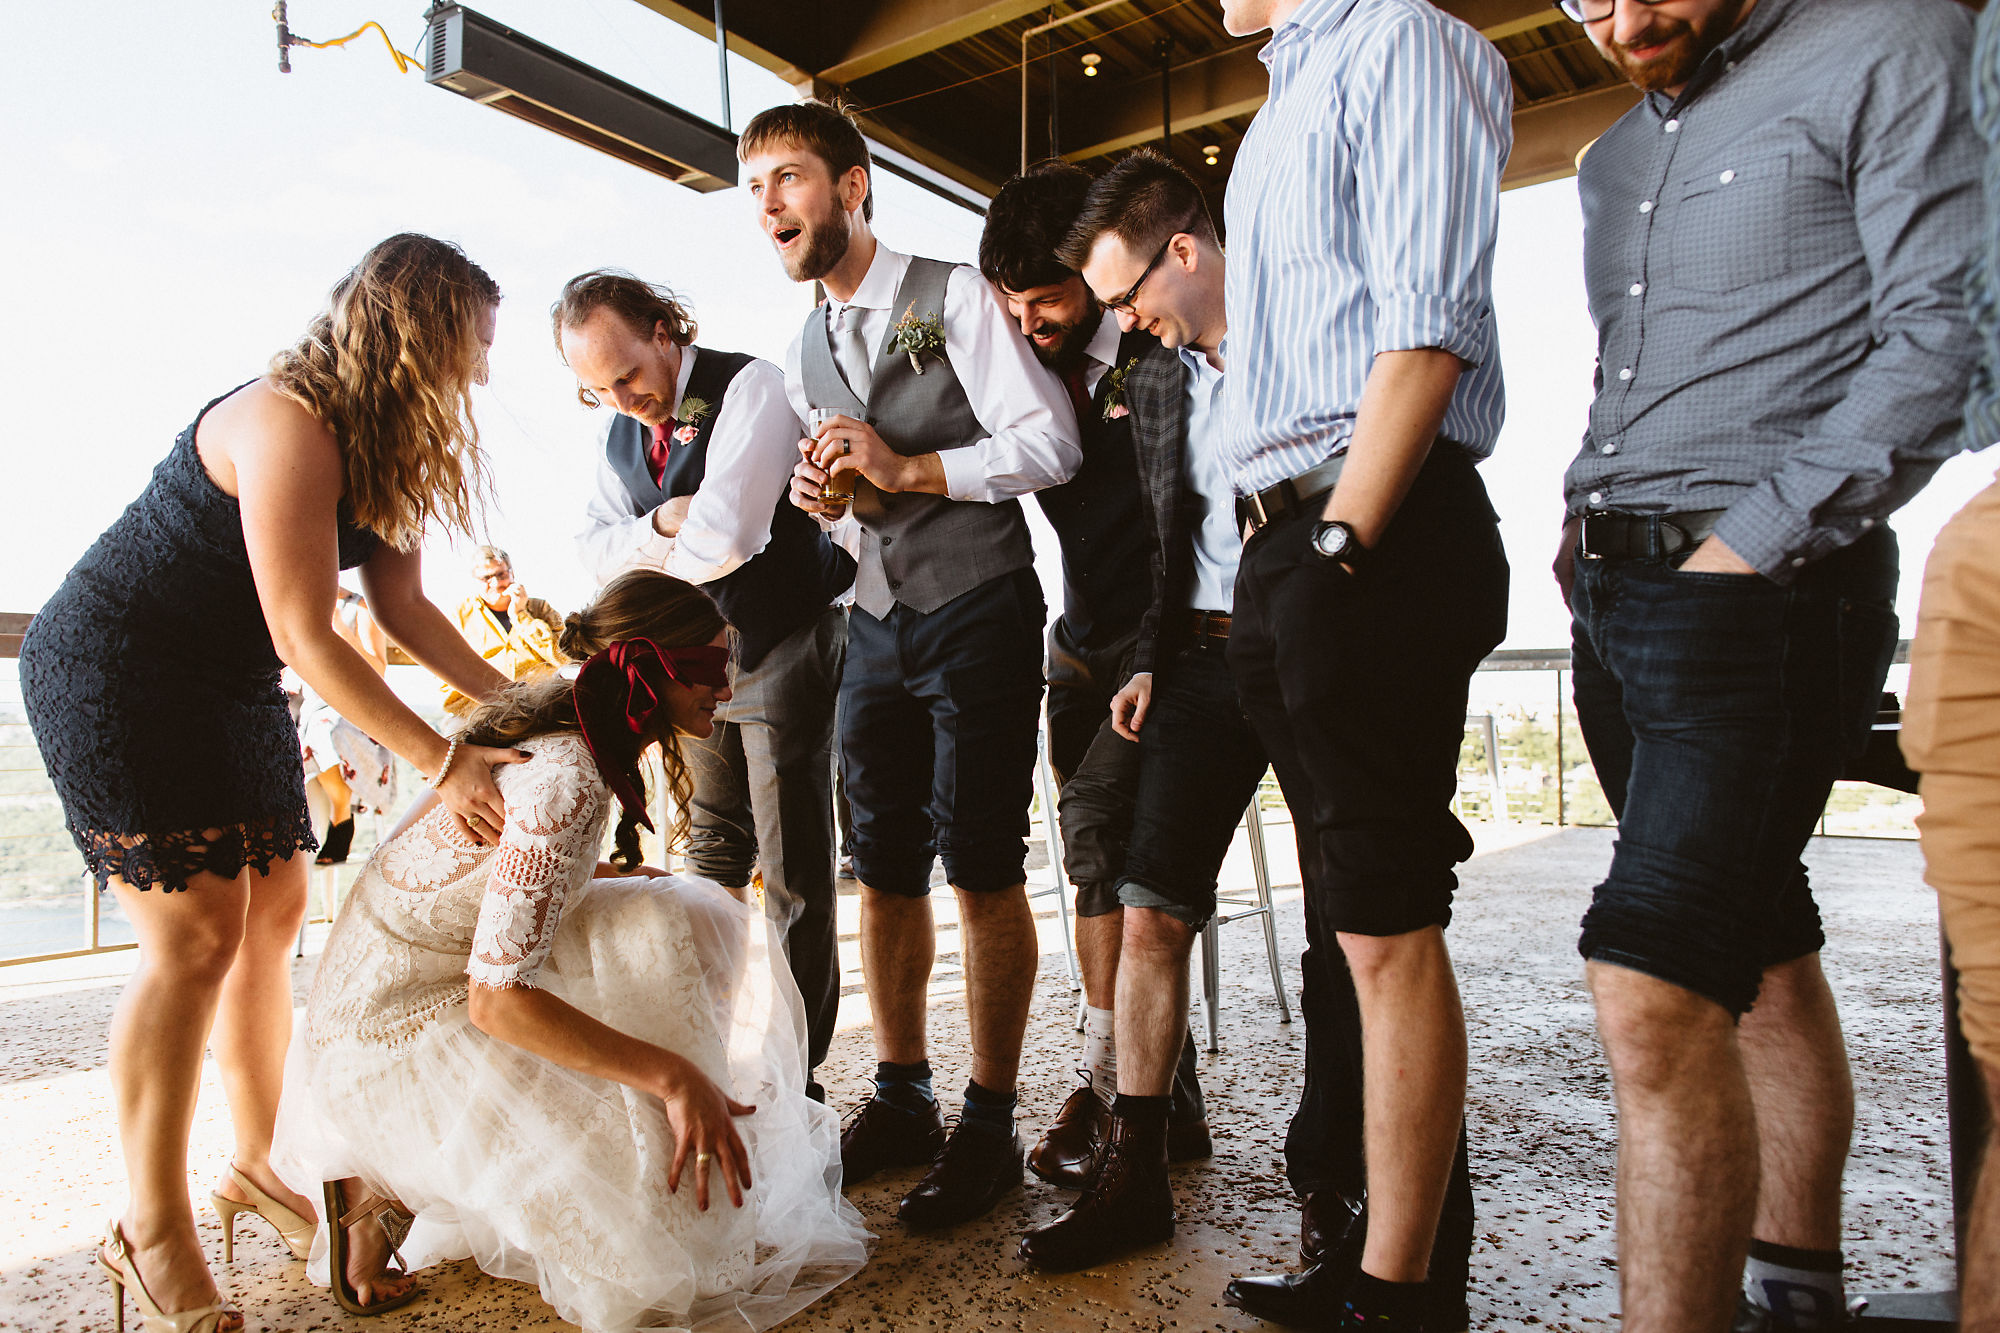 jessica_austin_oasis_brewery_wedding_photos161712.jpg